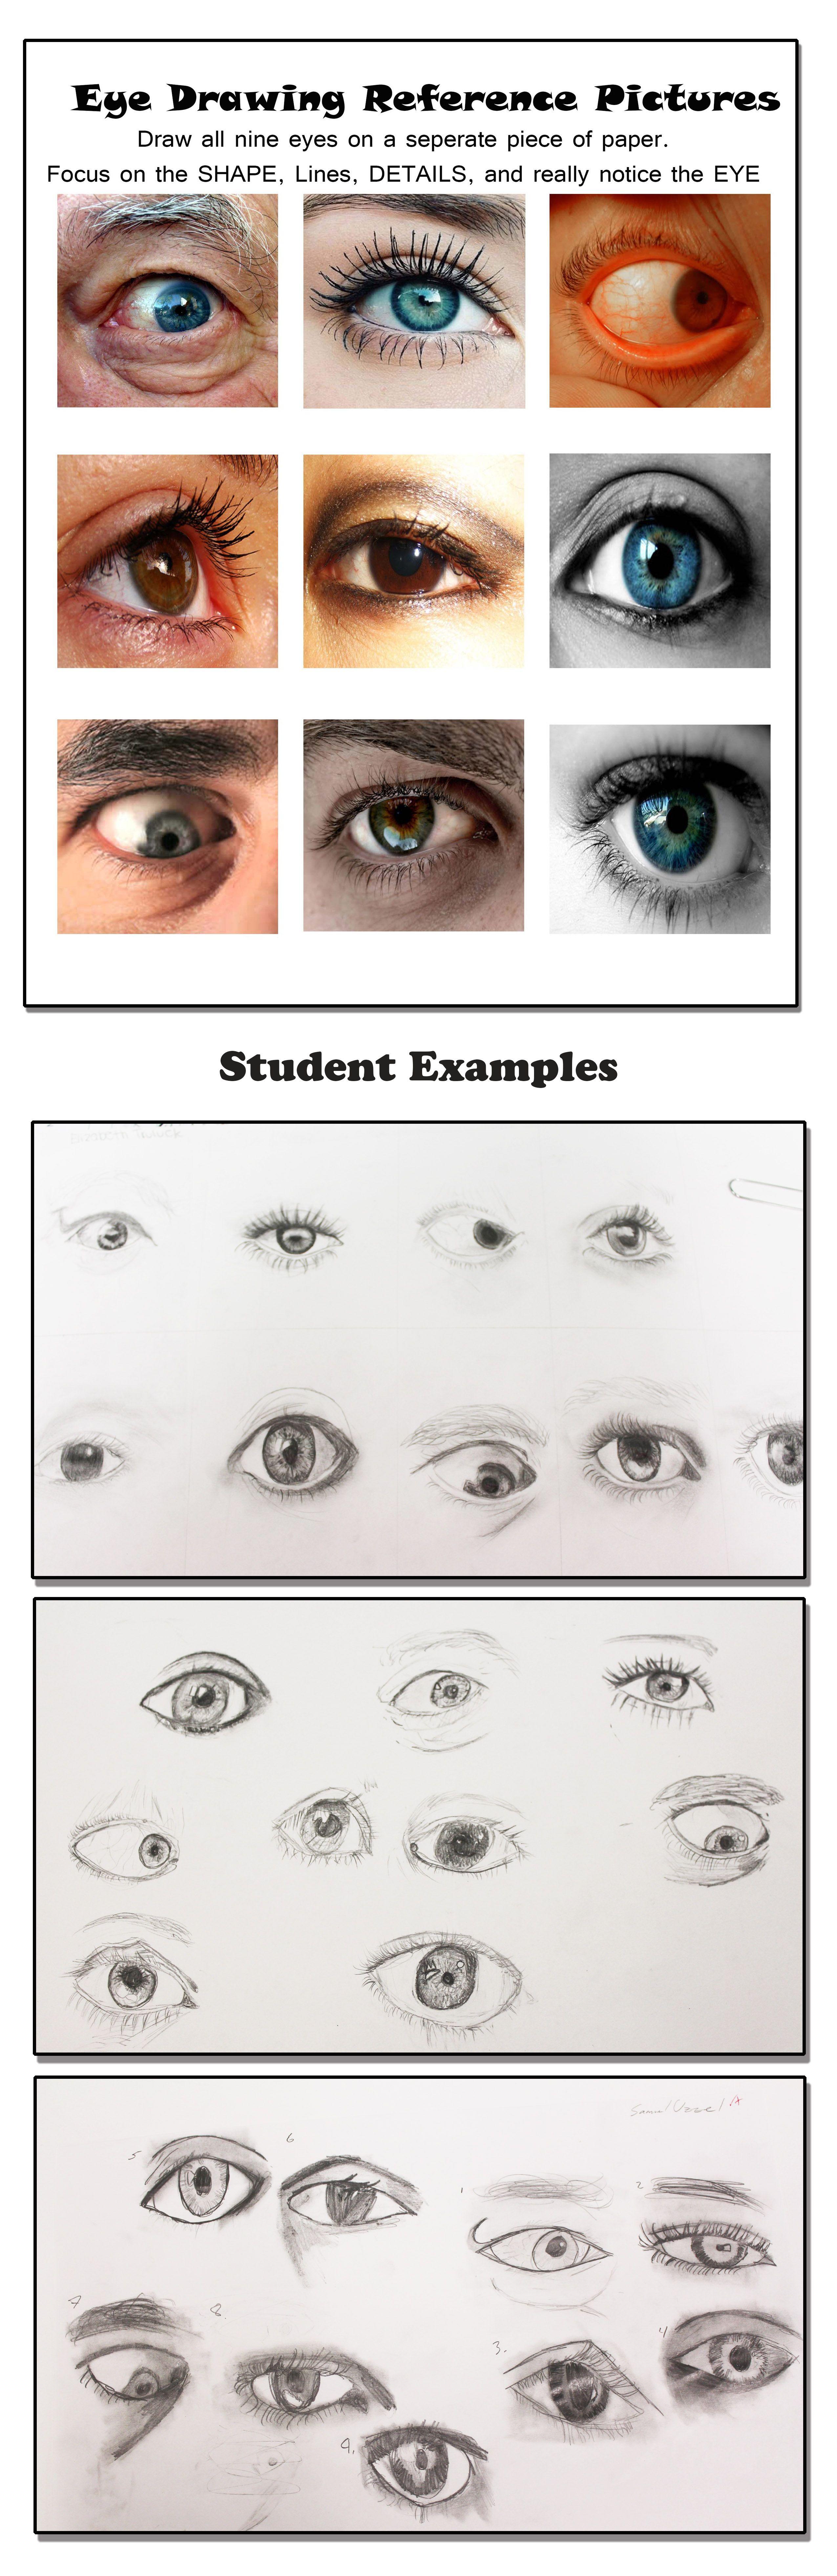 Art 1 Eye Drawings Learning To Draw The Eye Worksheet Myrtle Beach High School Mbhsart